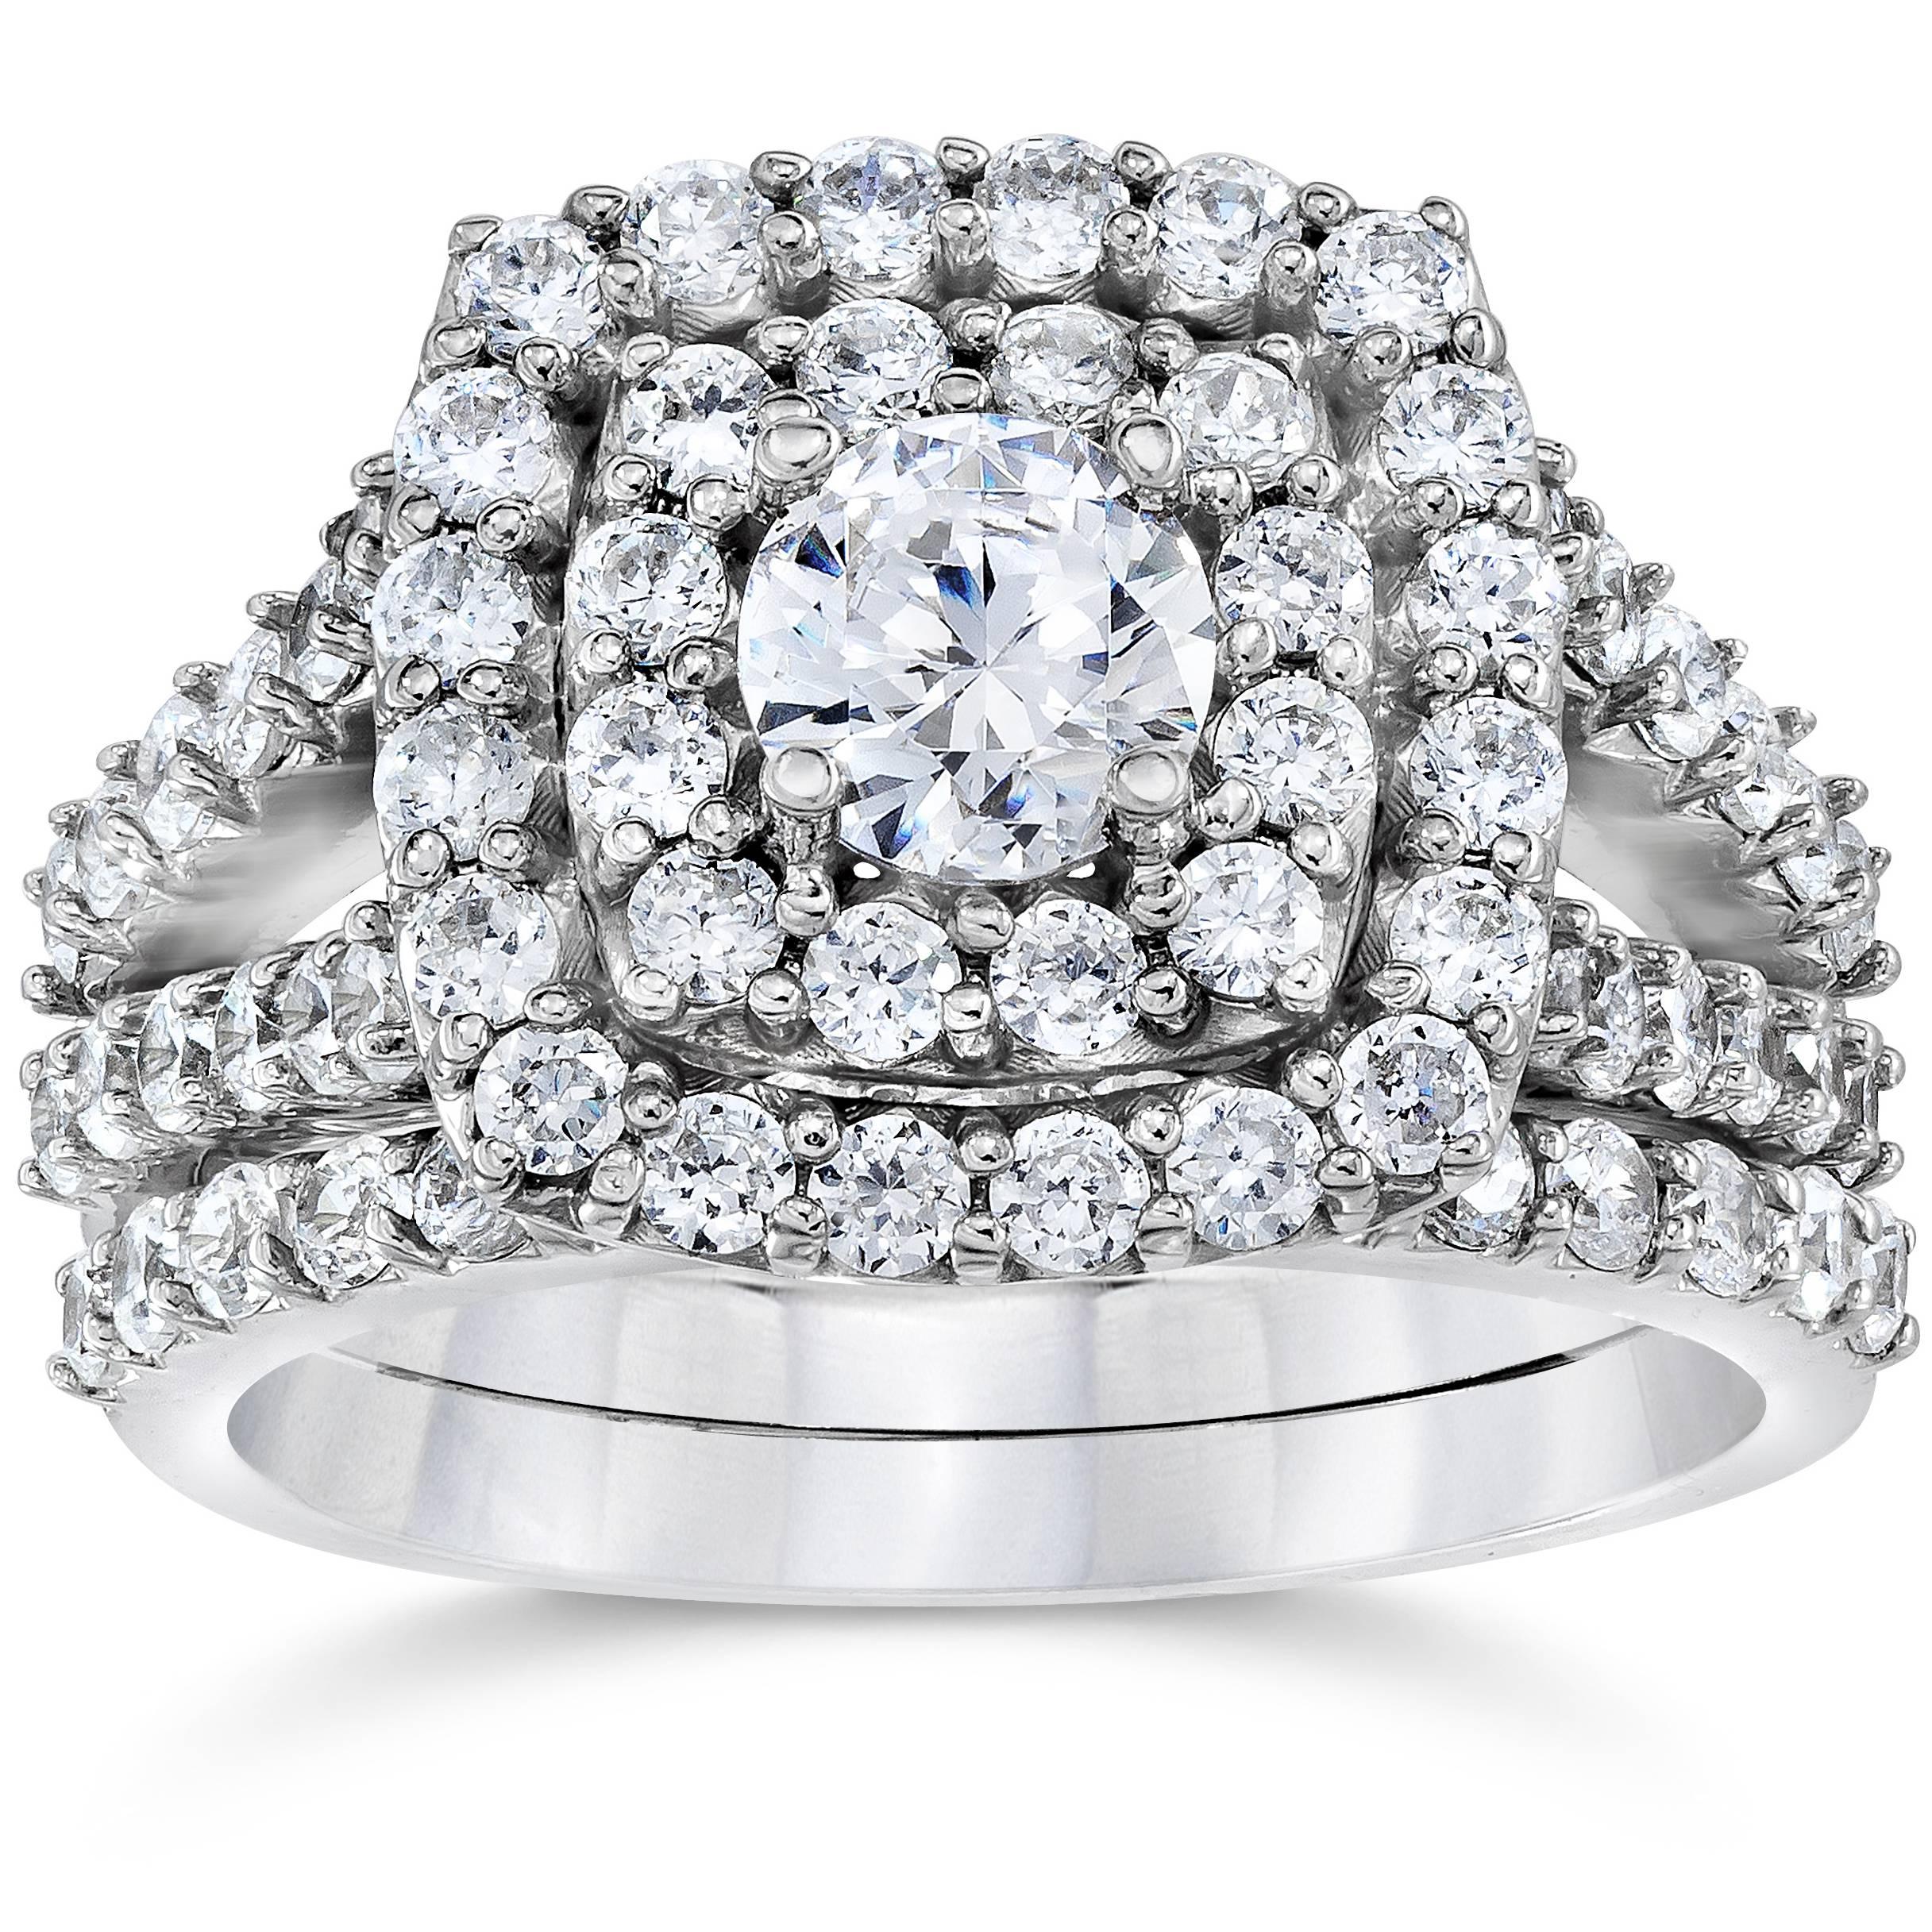 2 carat diamond cushion halo engagement wedding ring set. Black Bedroom Furniture Sets. Home Design Ideas